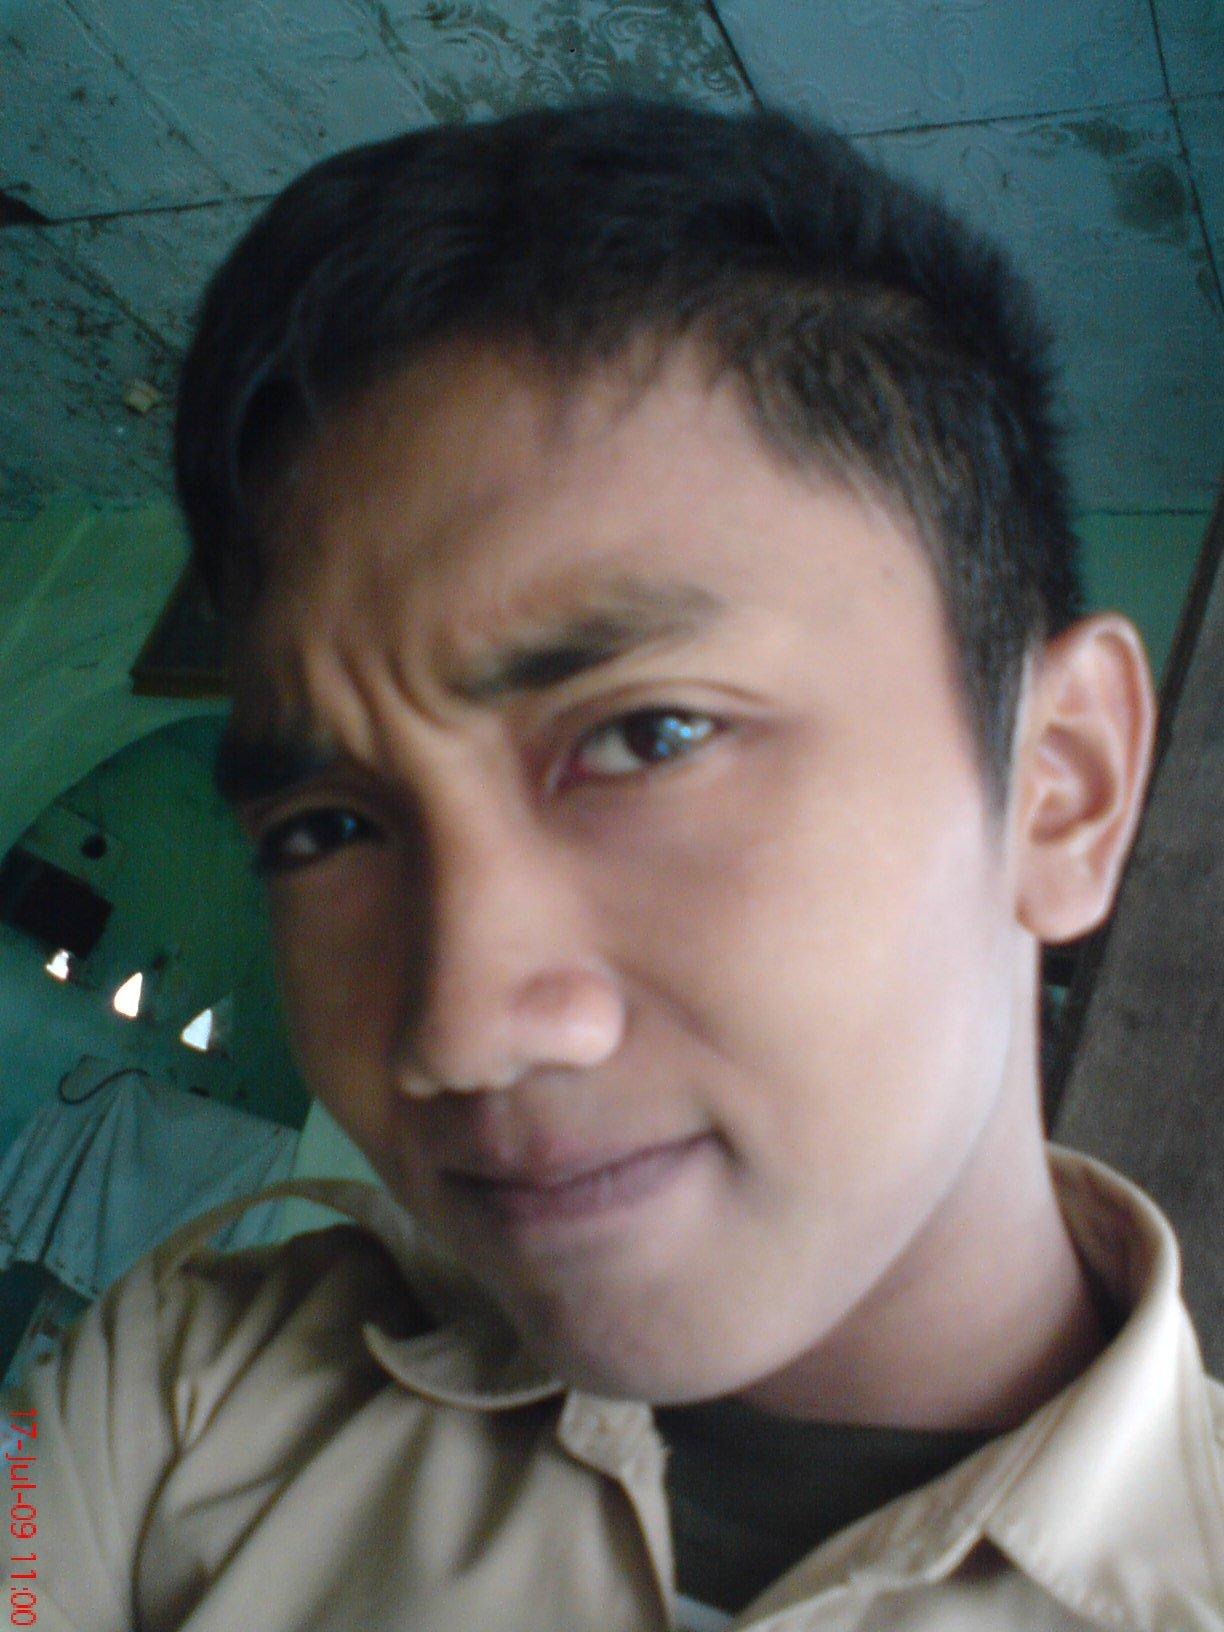 I m CoolJPG  Lakilaki  Cowok Cakep  FotoGambar Umum